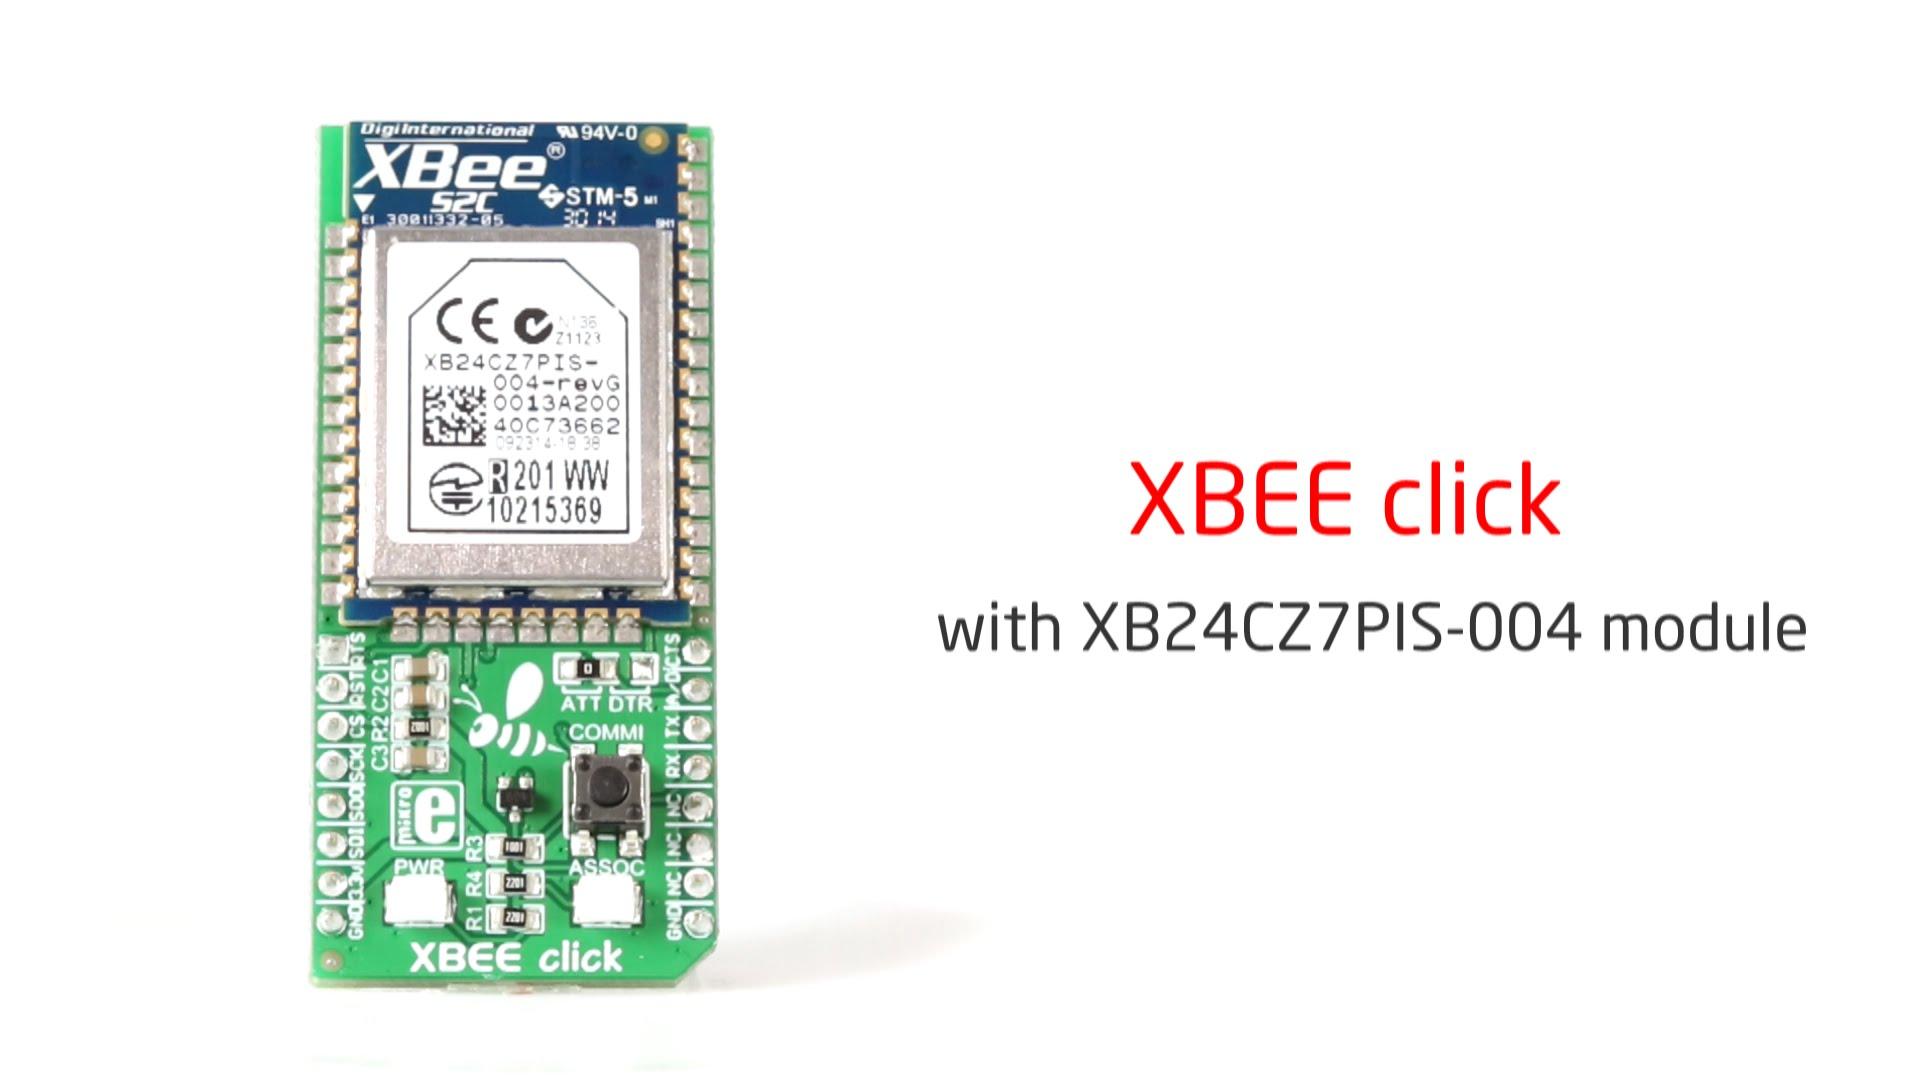 XBee click released